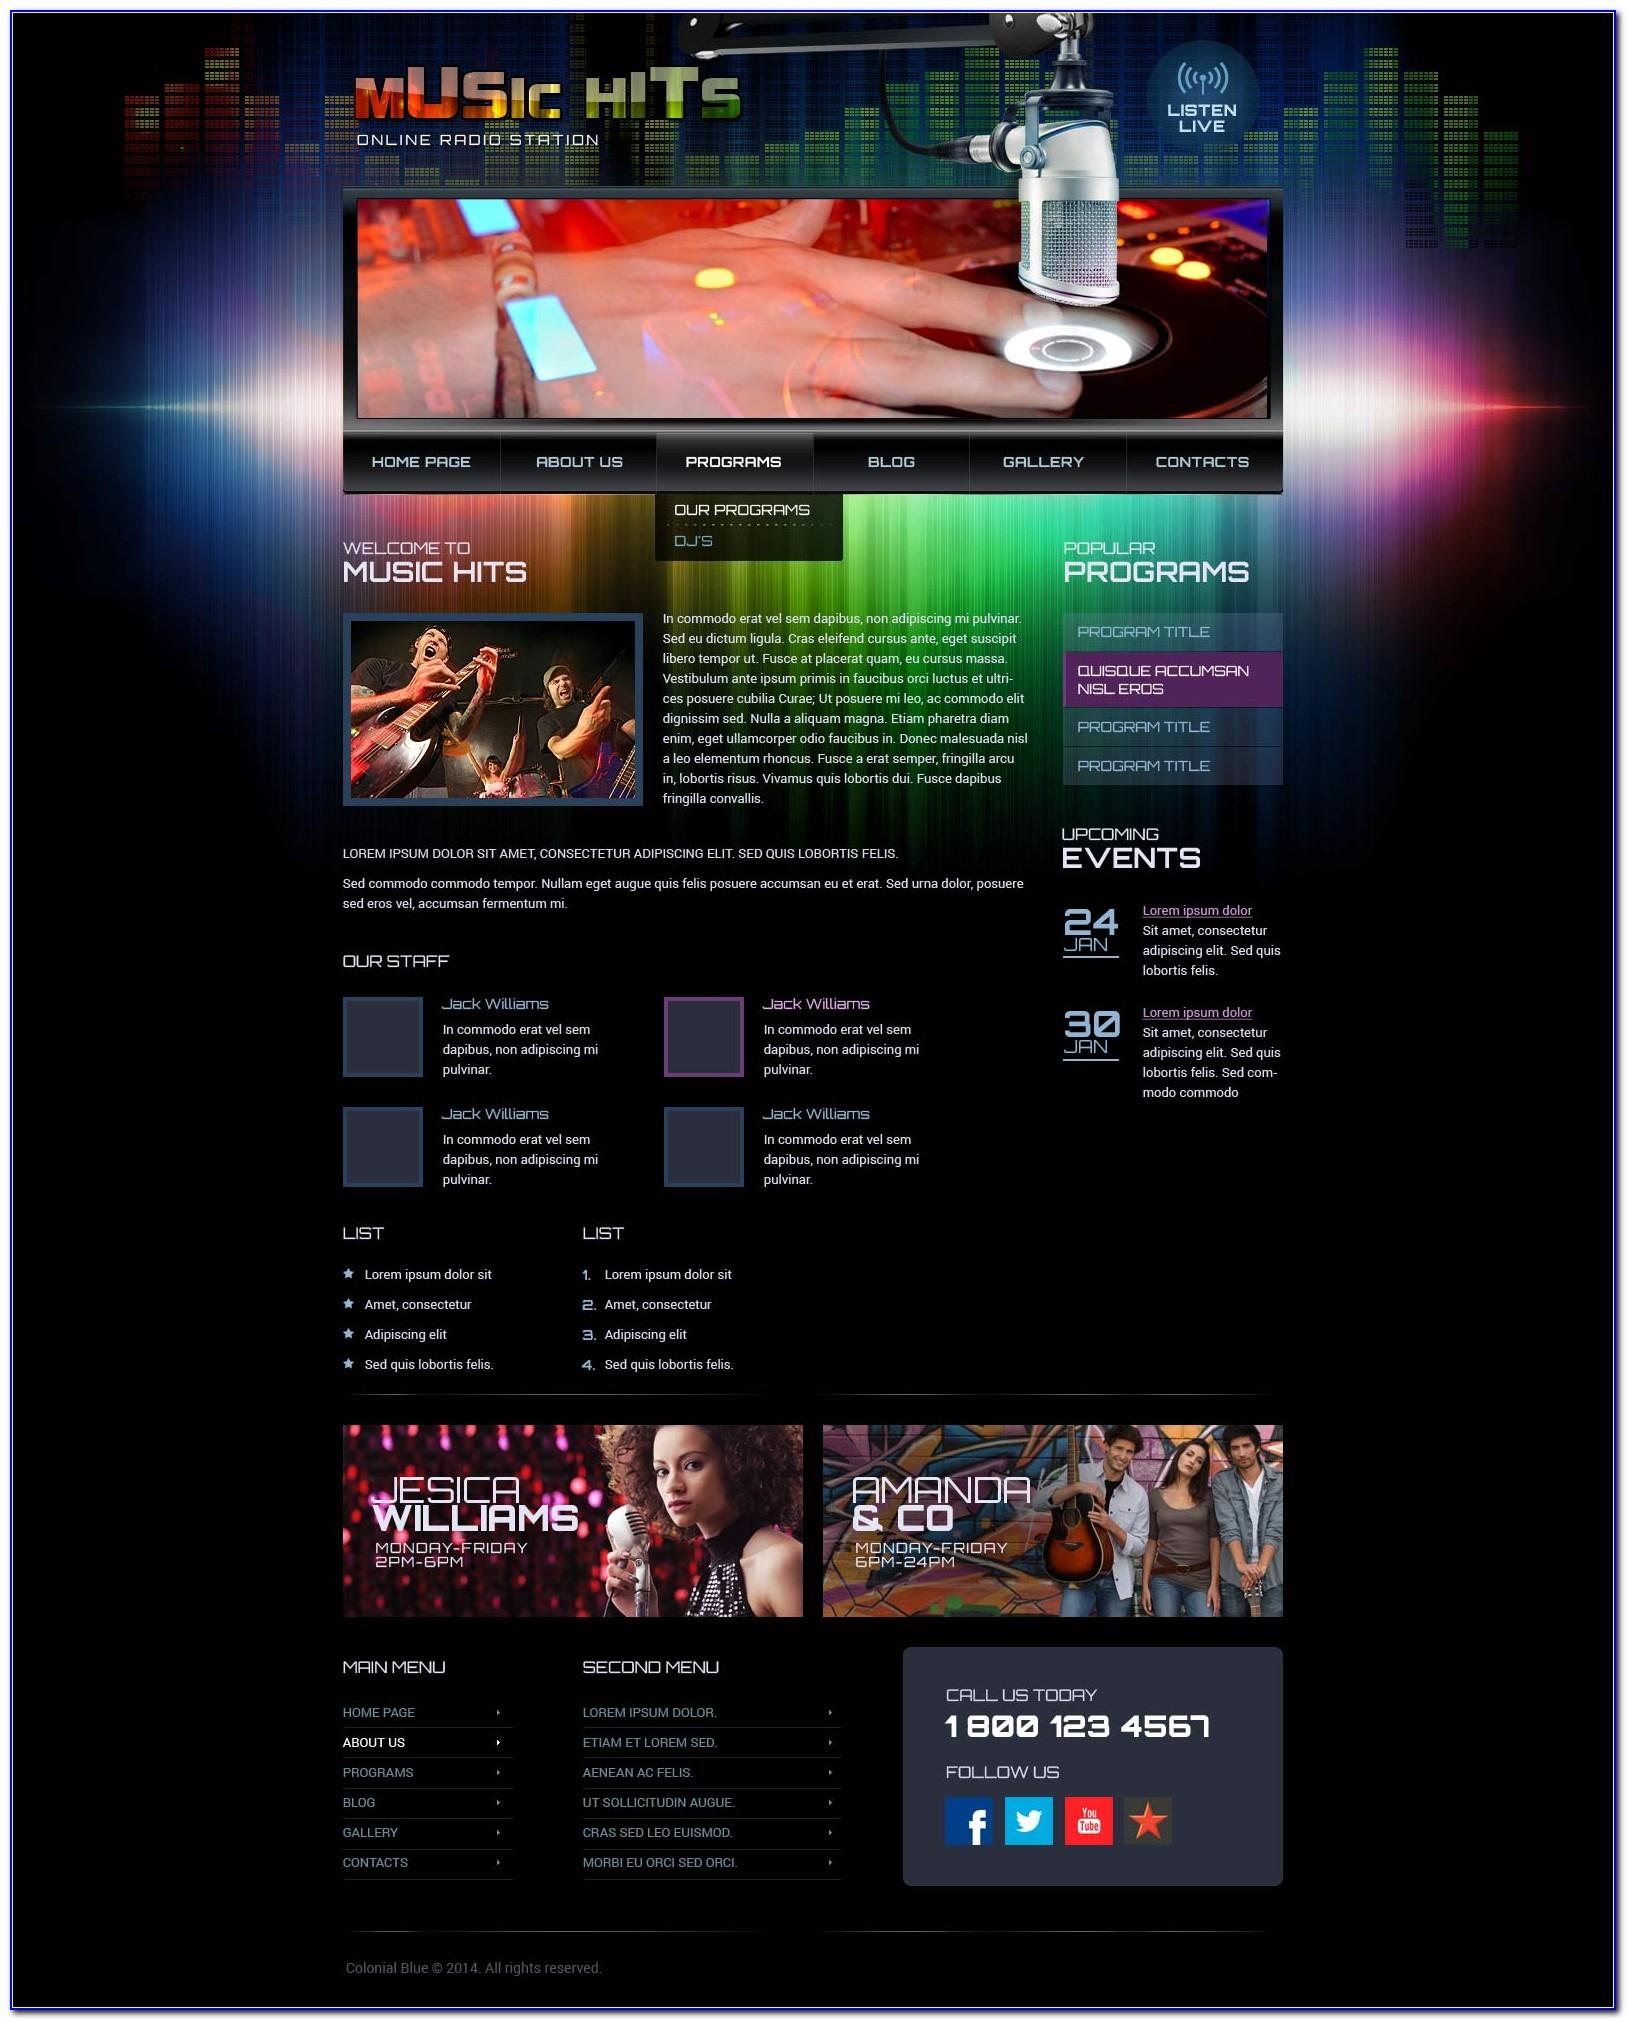 Internet Radio Station Website Template Free